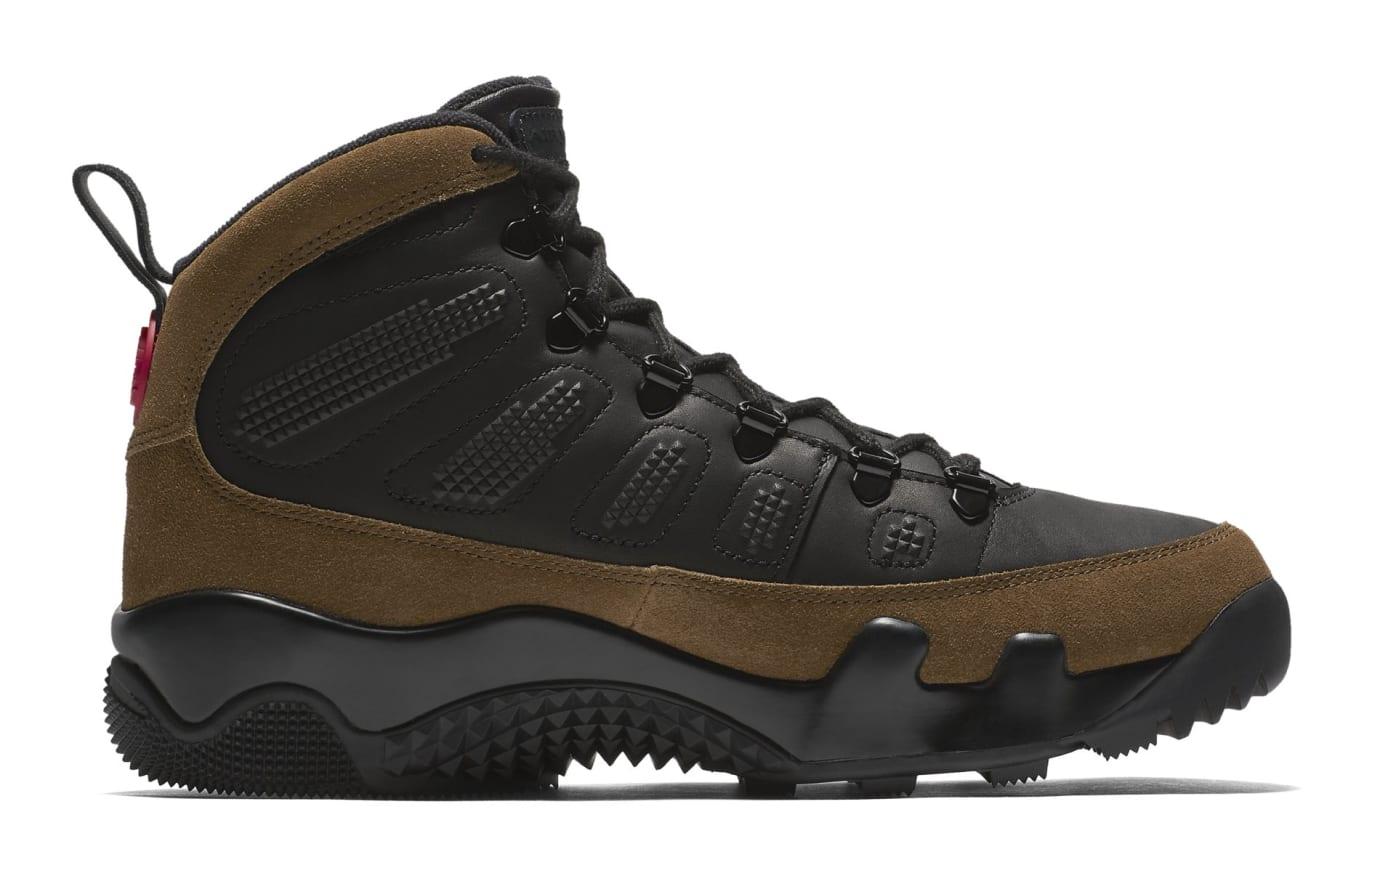 Air Jordan 9 NRG Boot 'Olive' AR4491-012 (Medial)